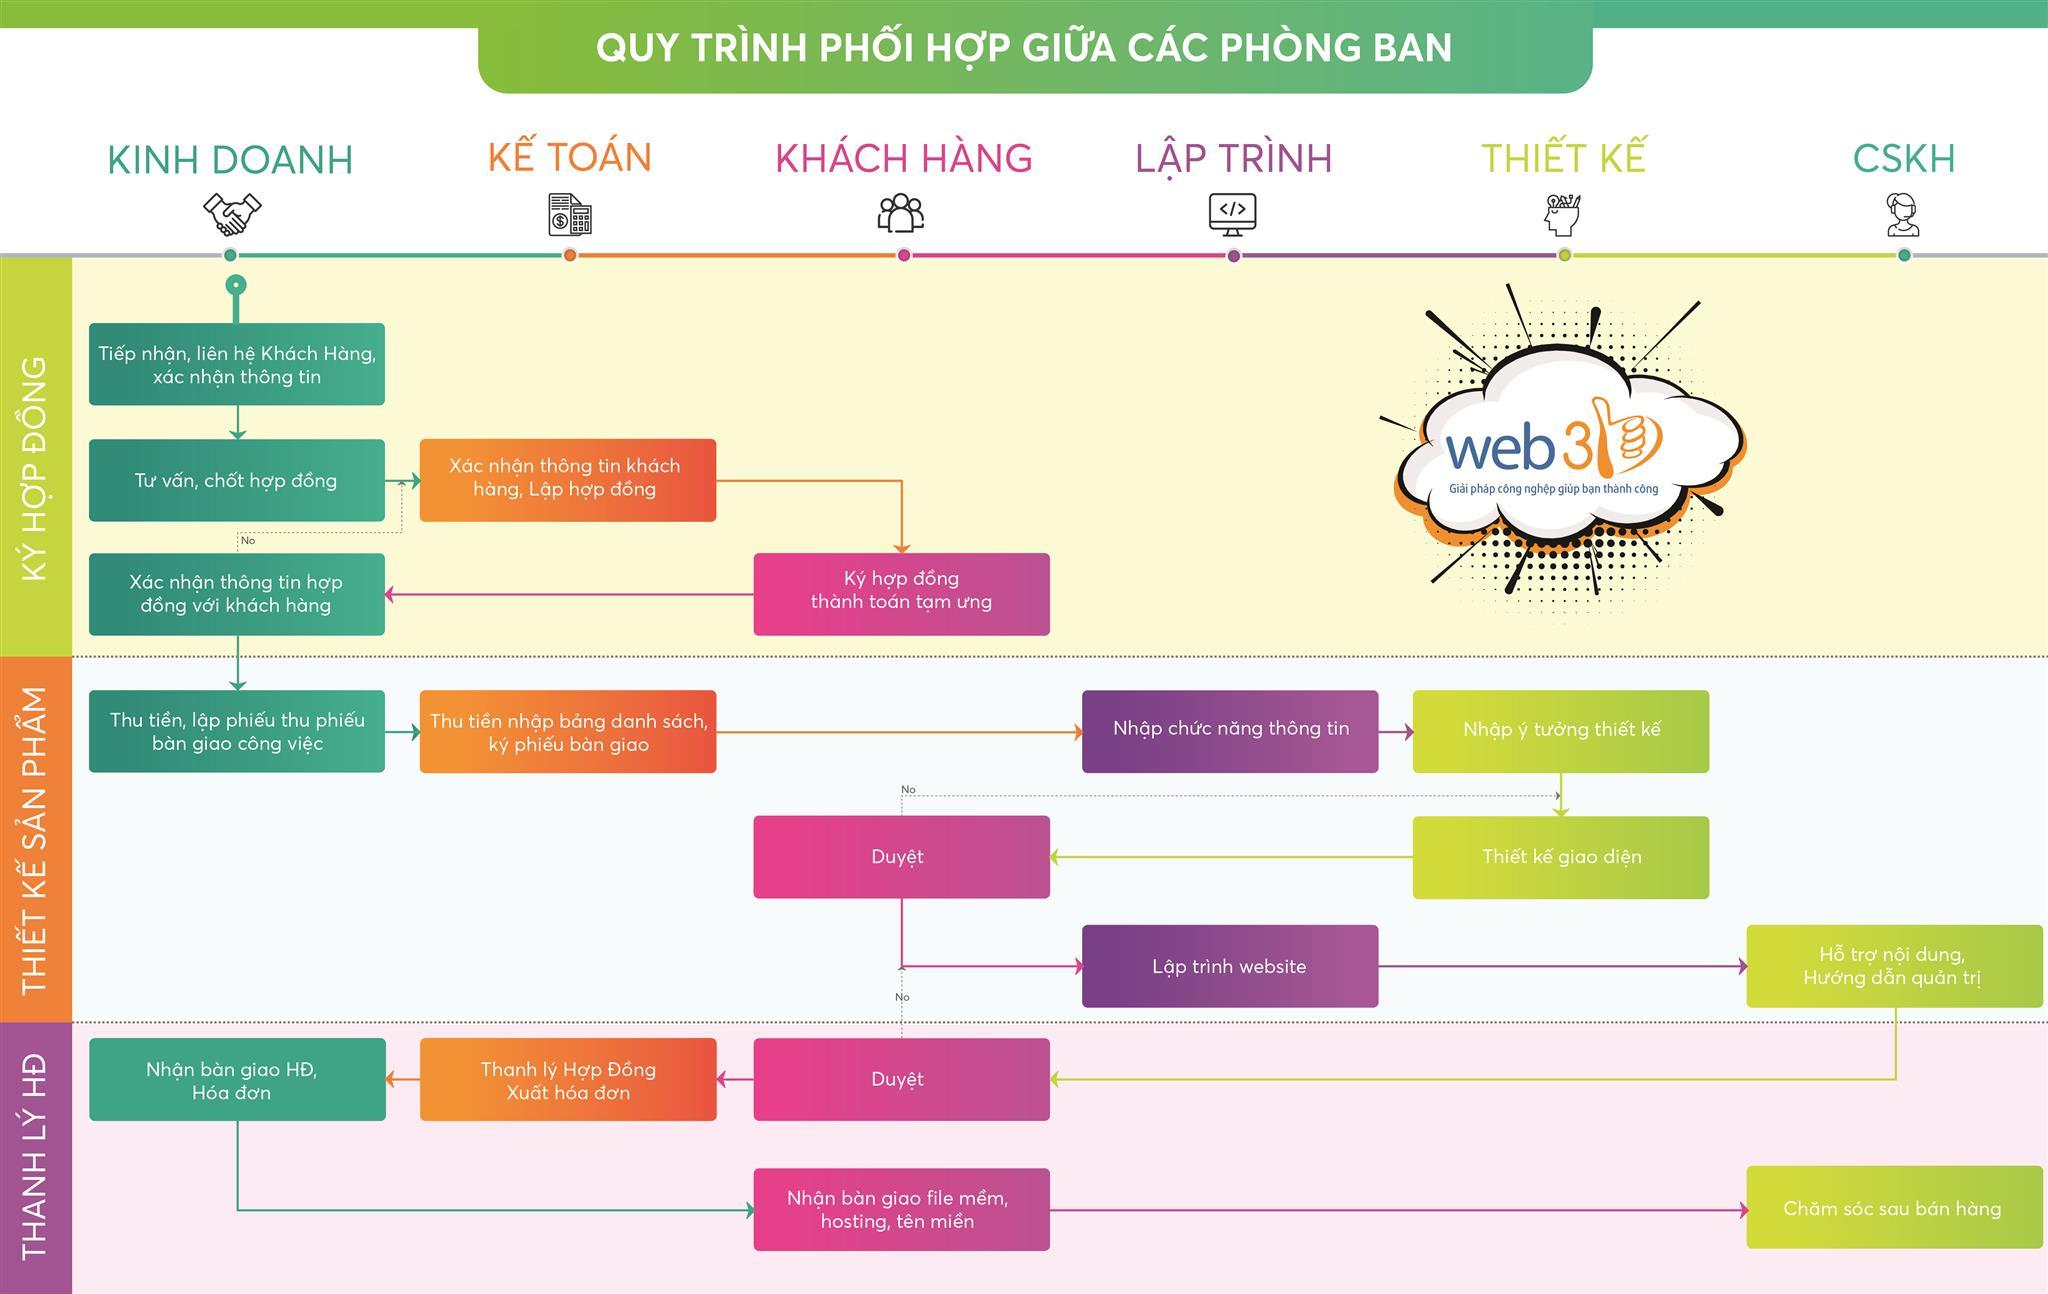 quy-trinh-lam-viec-web3b